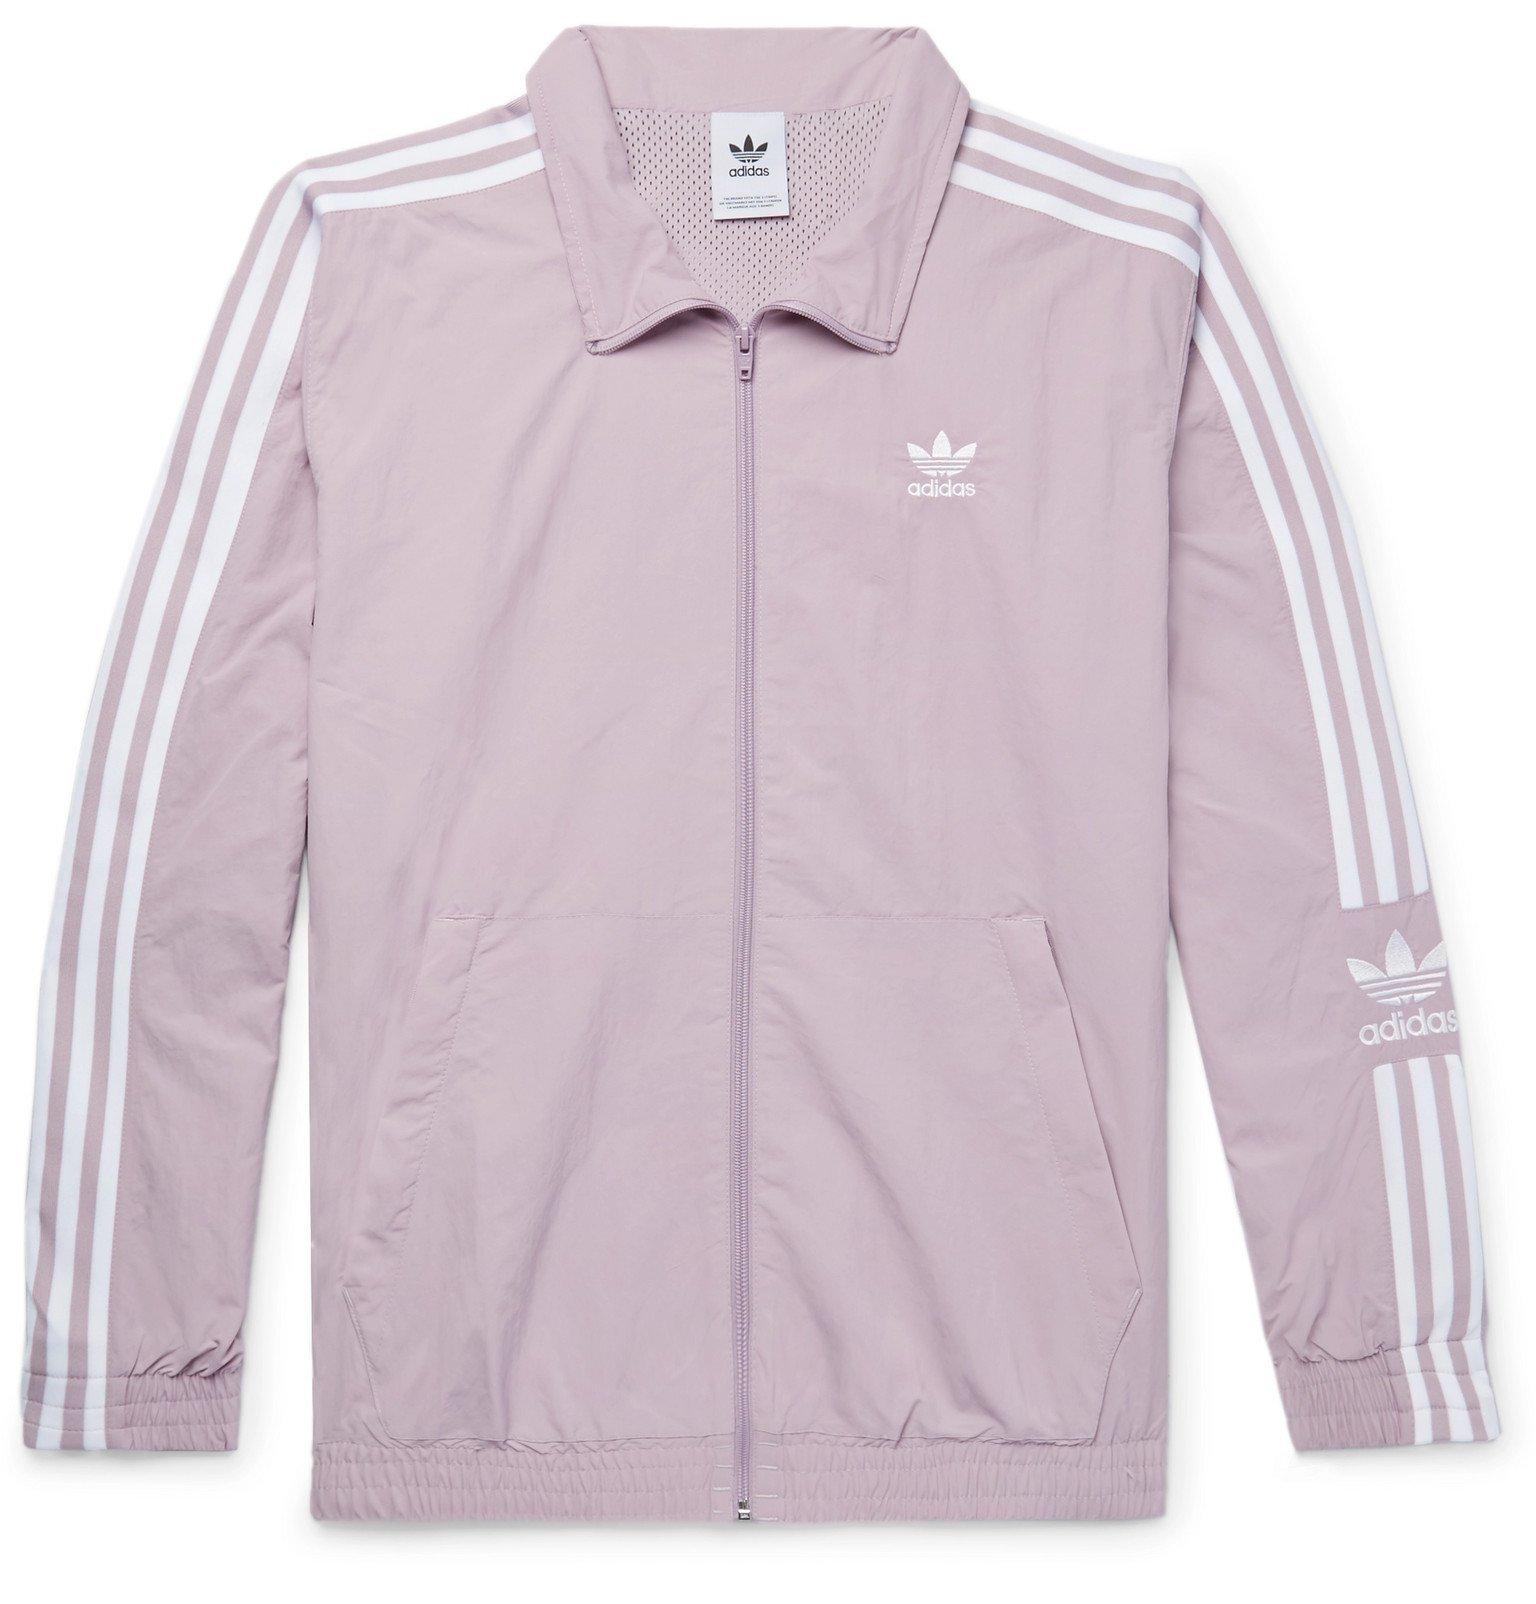 adidas Originals - Logo-Embroidered Nylon Track Jacket - Purple